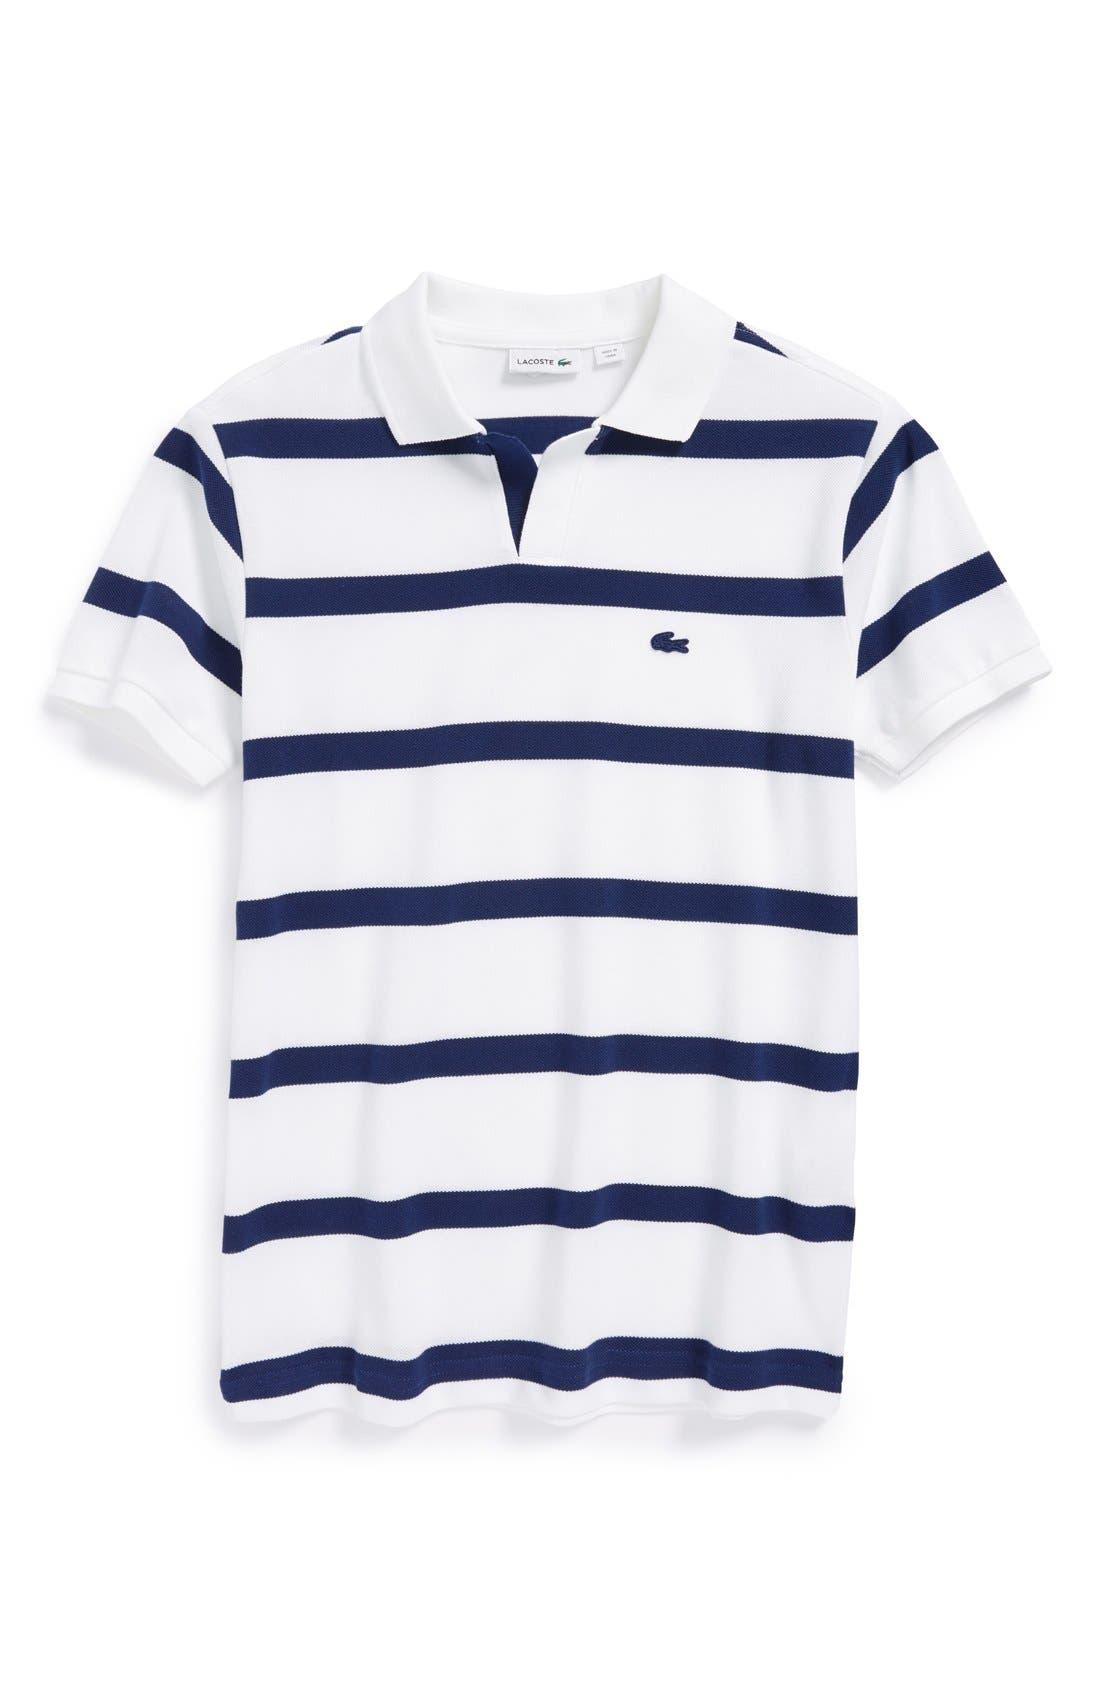 Alternate Image 1 Selected - Lacoste Stripe Cotton Piqué Polo (Little Boys & Big Boys)